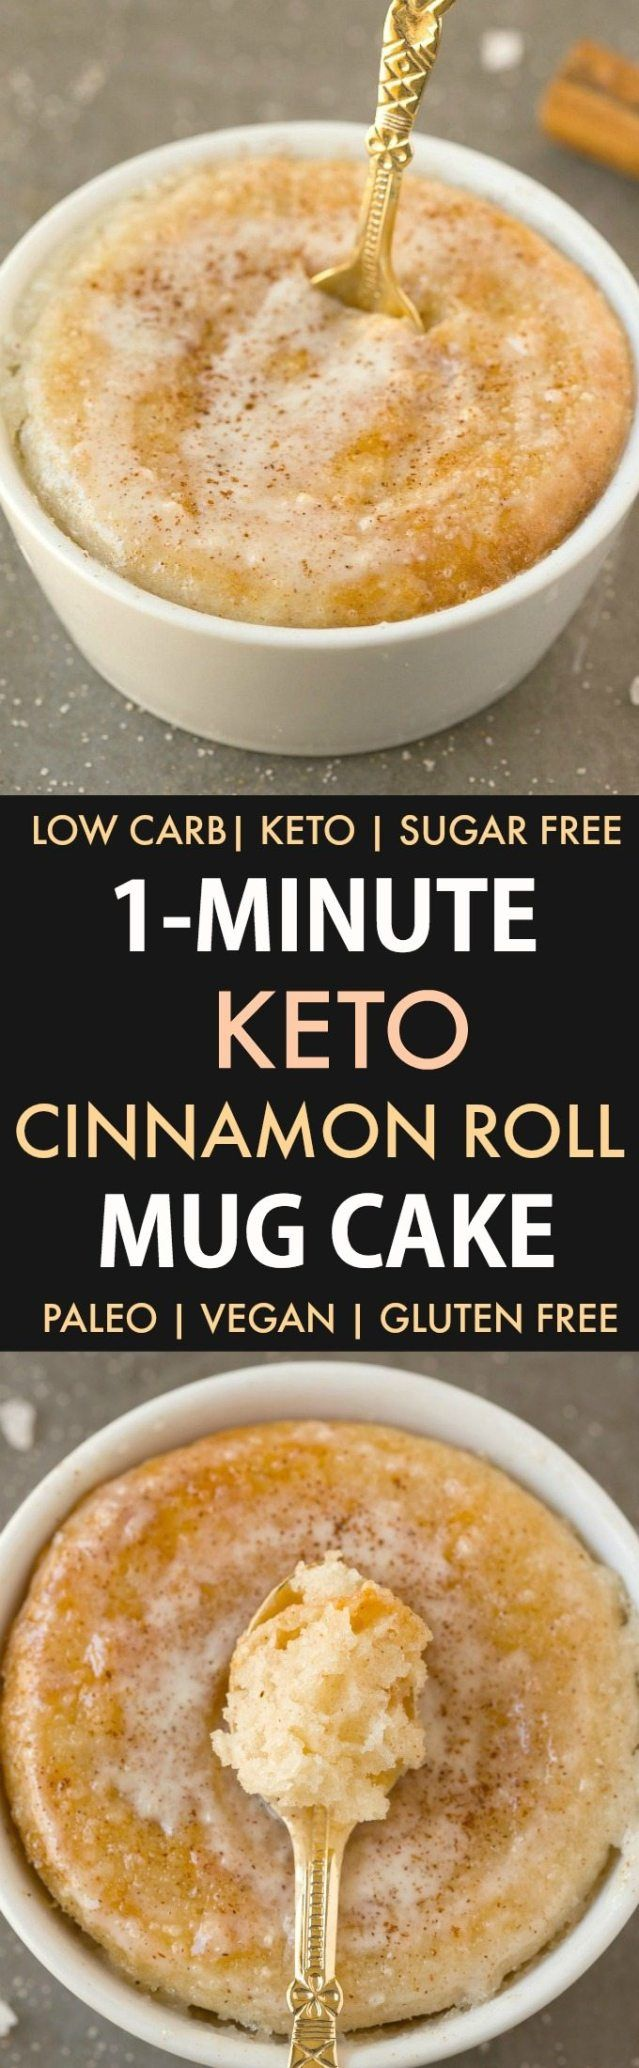 1-Minute Keto Cinnamon Roll Mug Cake (Paleo, Vegan, Sugar ...